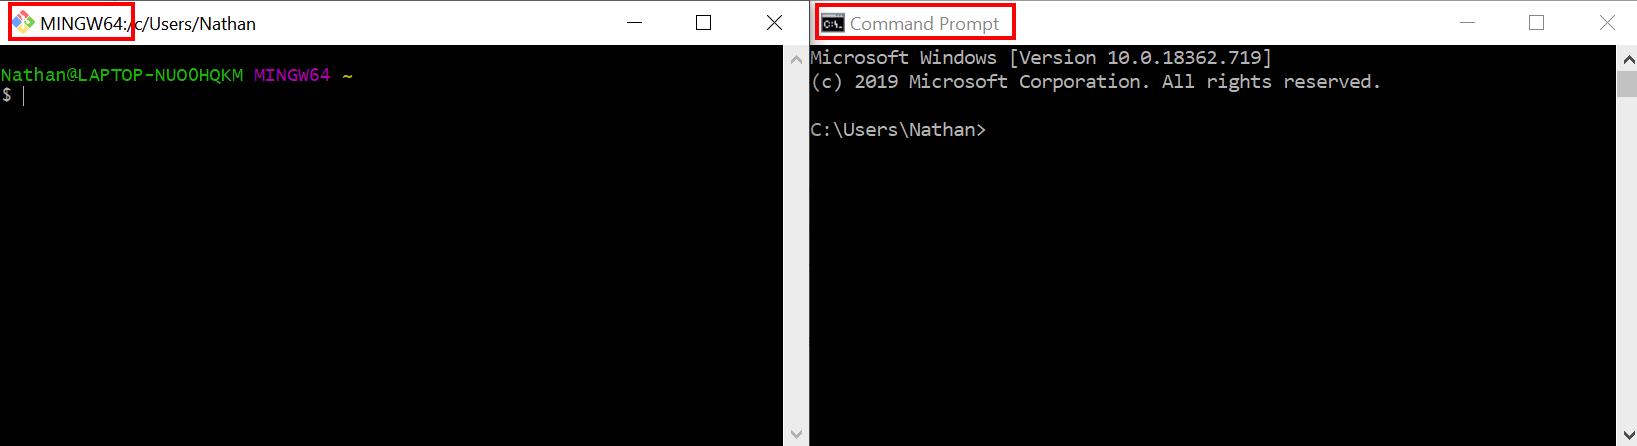 Git Bash vs. Command Prompt differences